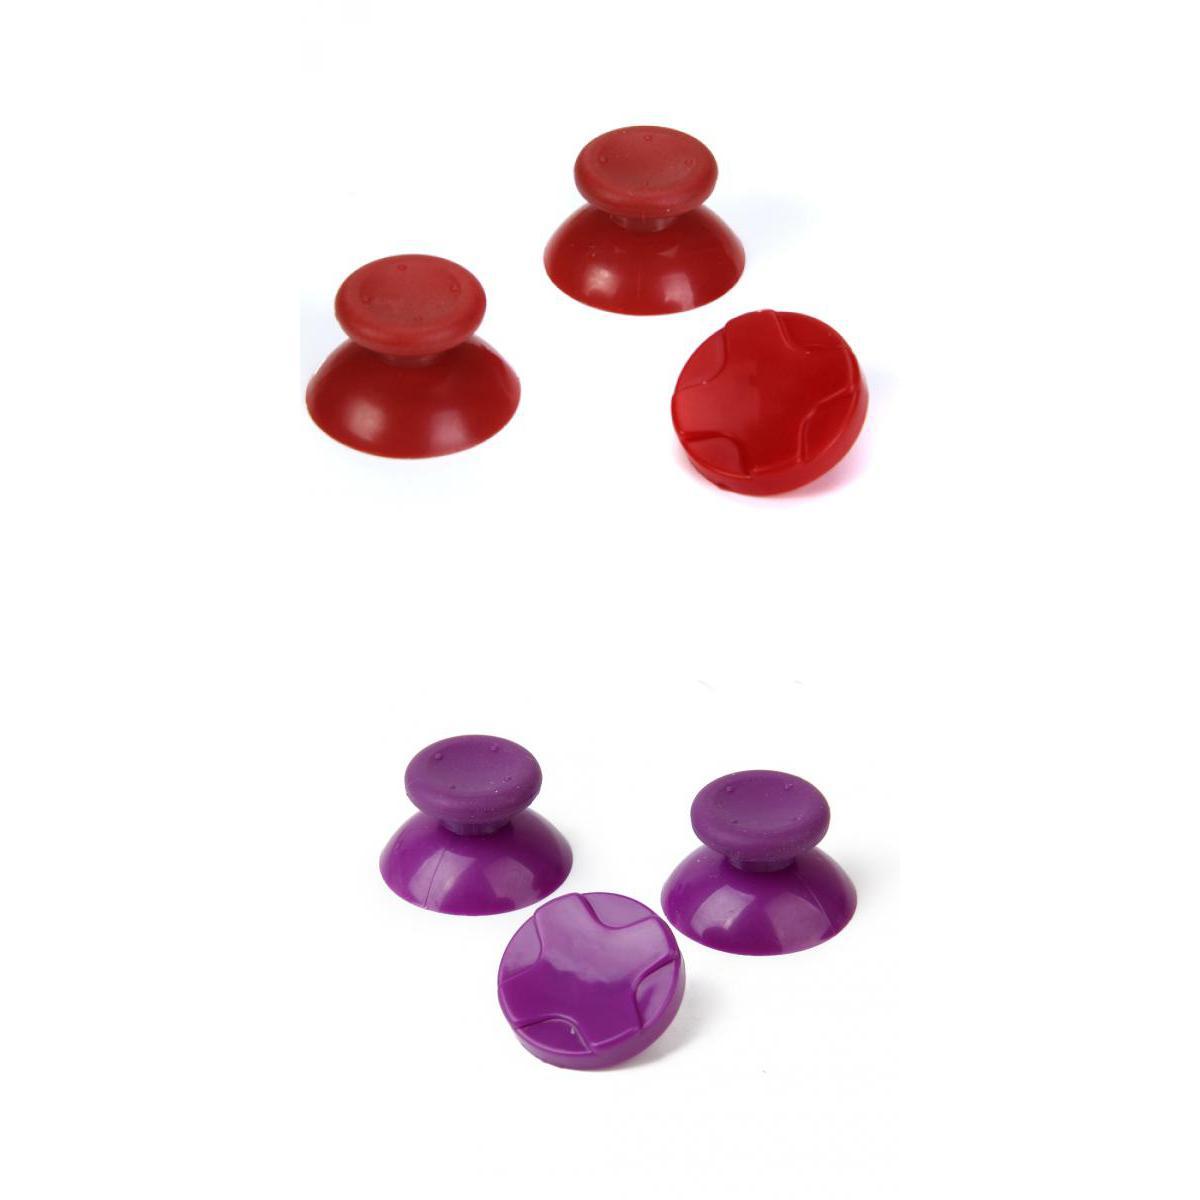 2 Sets Purple + Red Thumb Stick Joystick Caps +D-pad for Microsoft Xbox 360